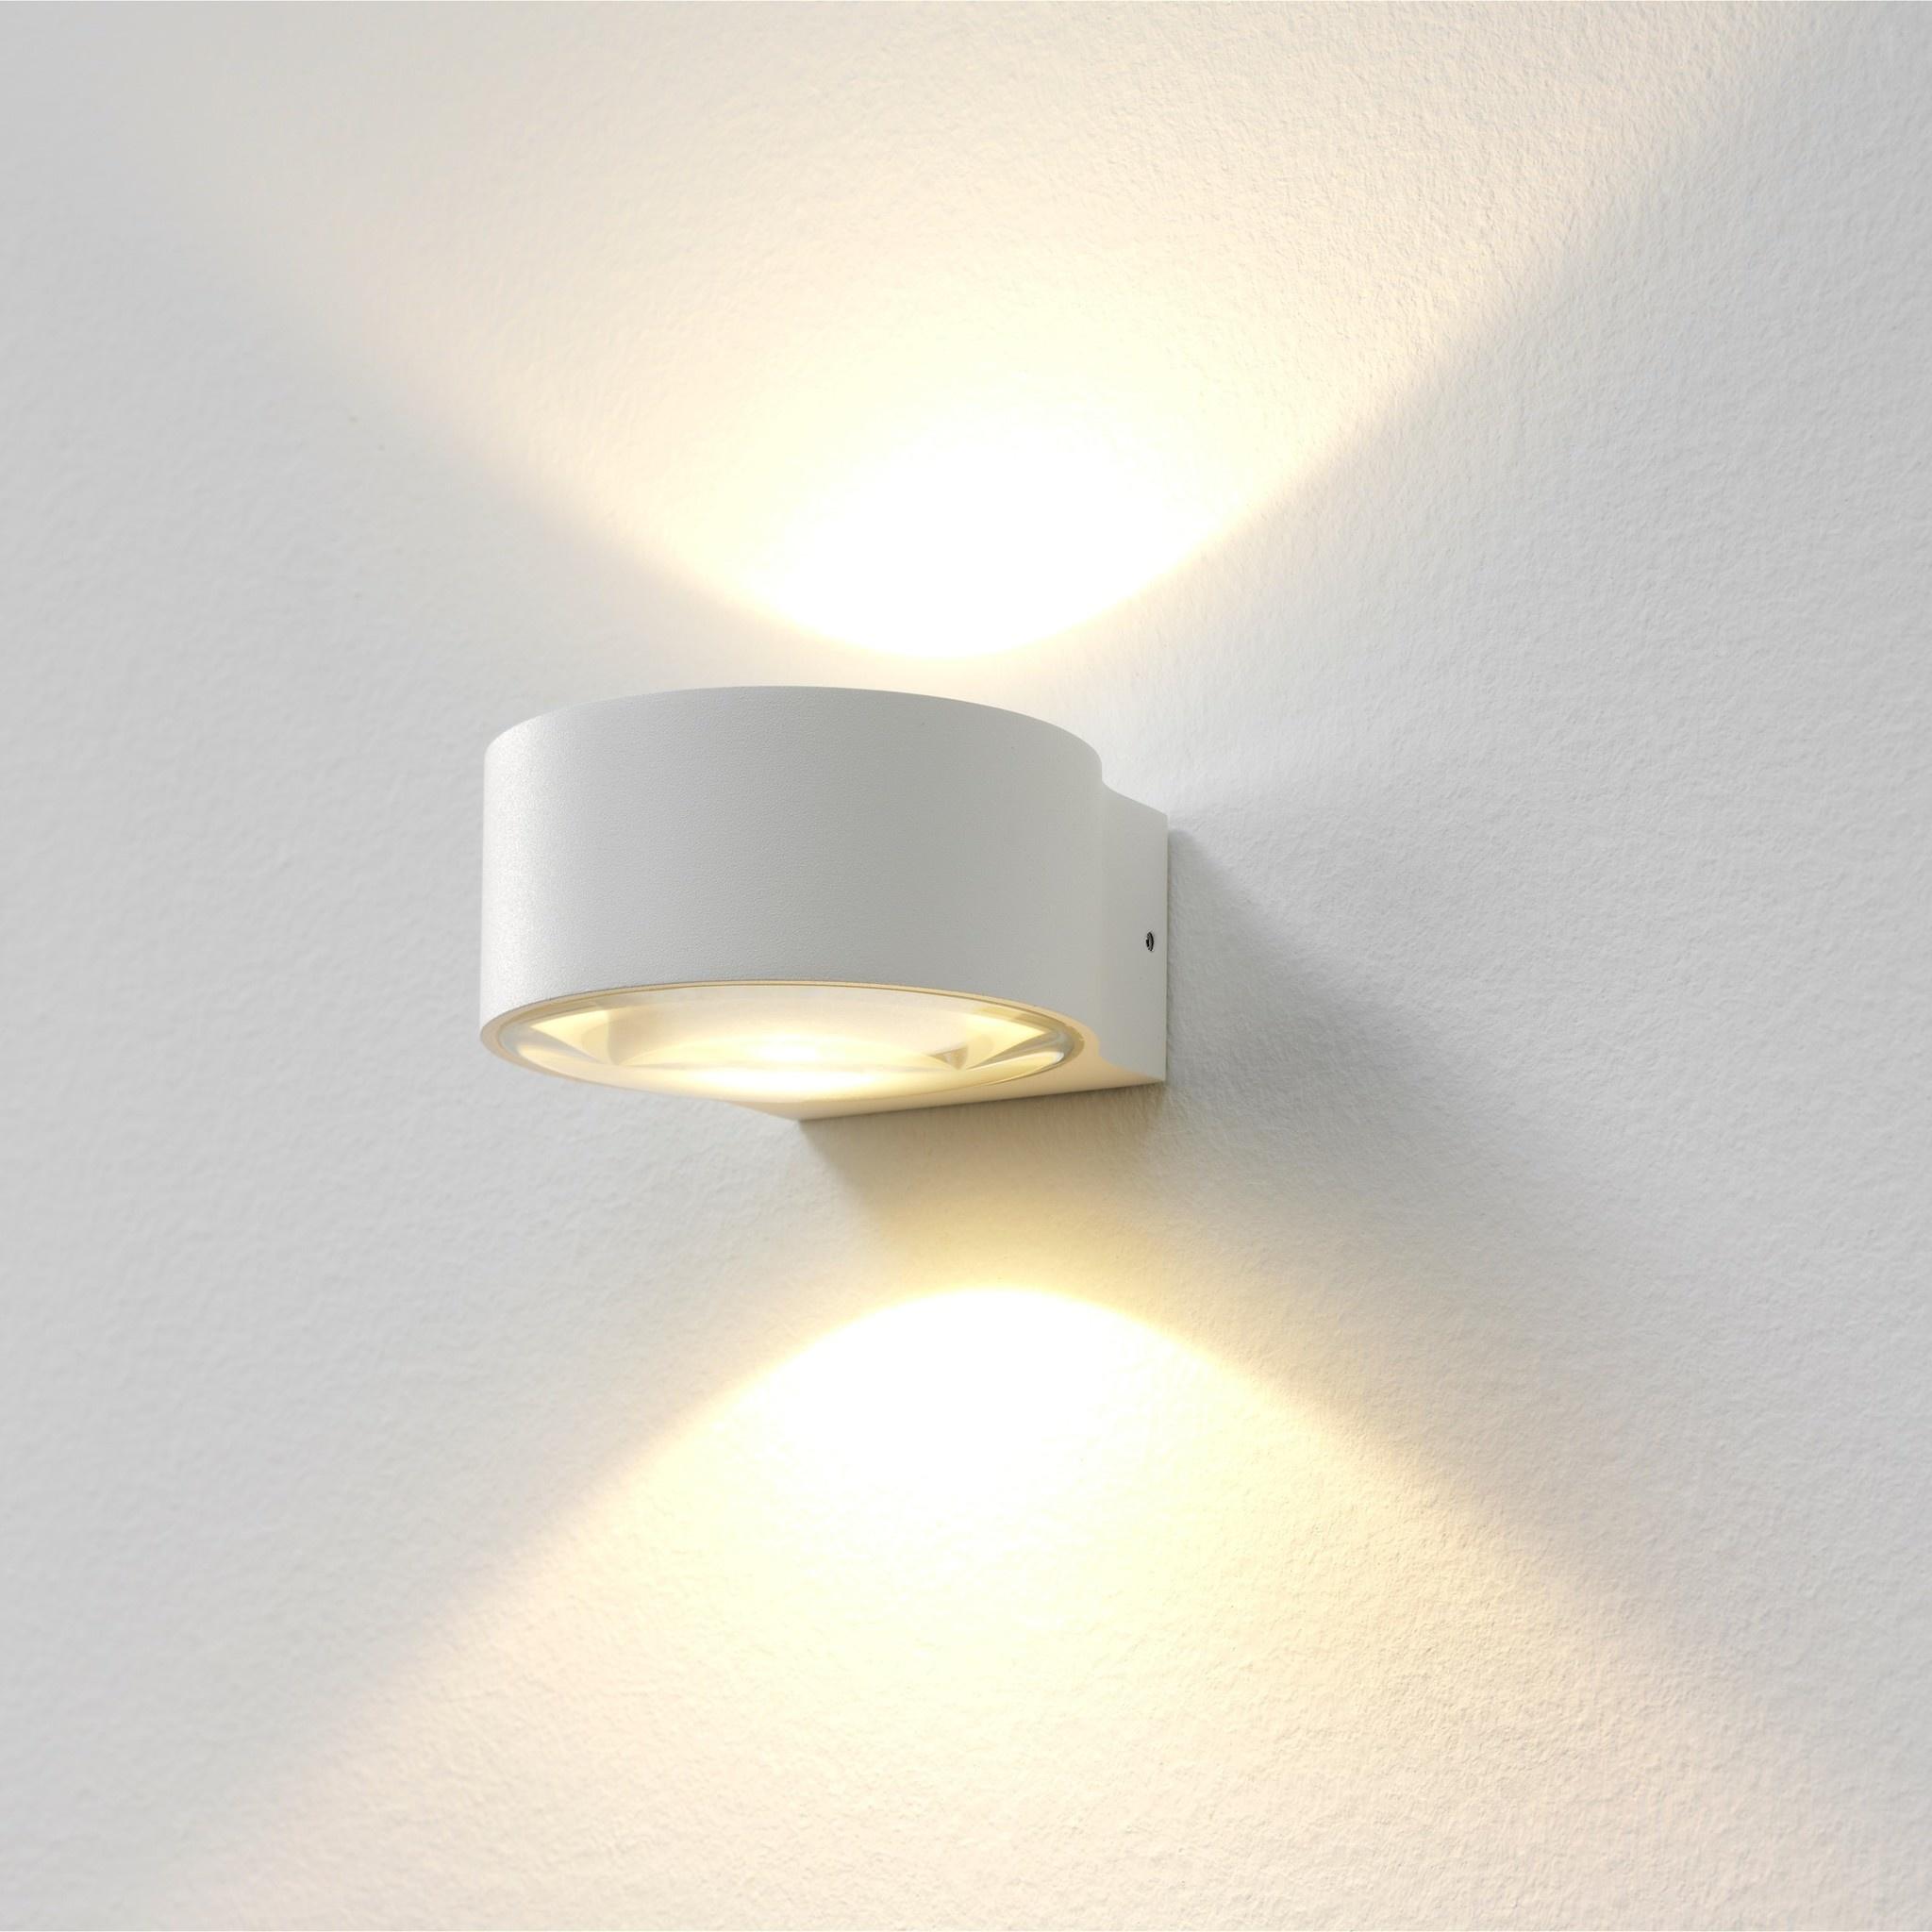 Artdelight Wandlamp Hudson Ø 11 cm wit